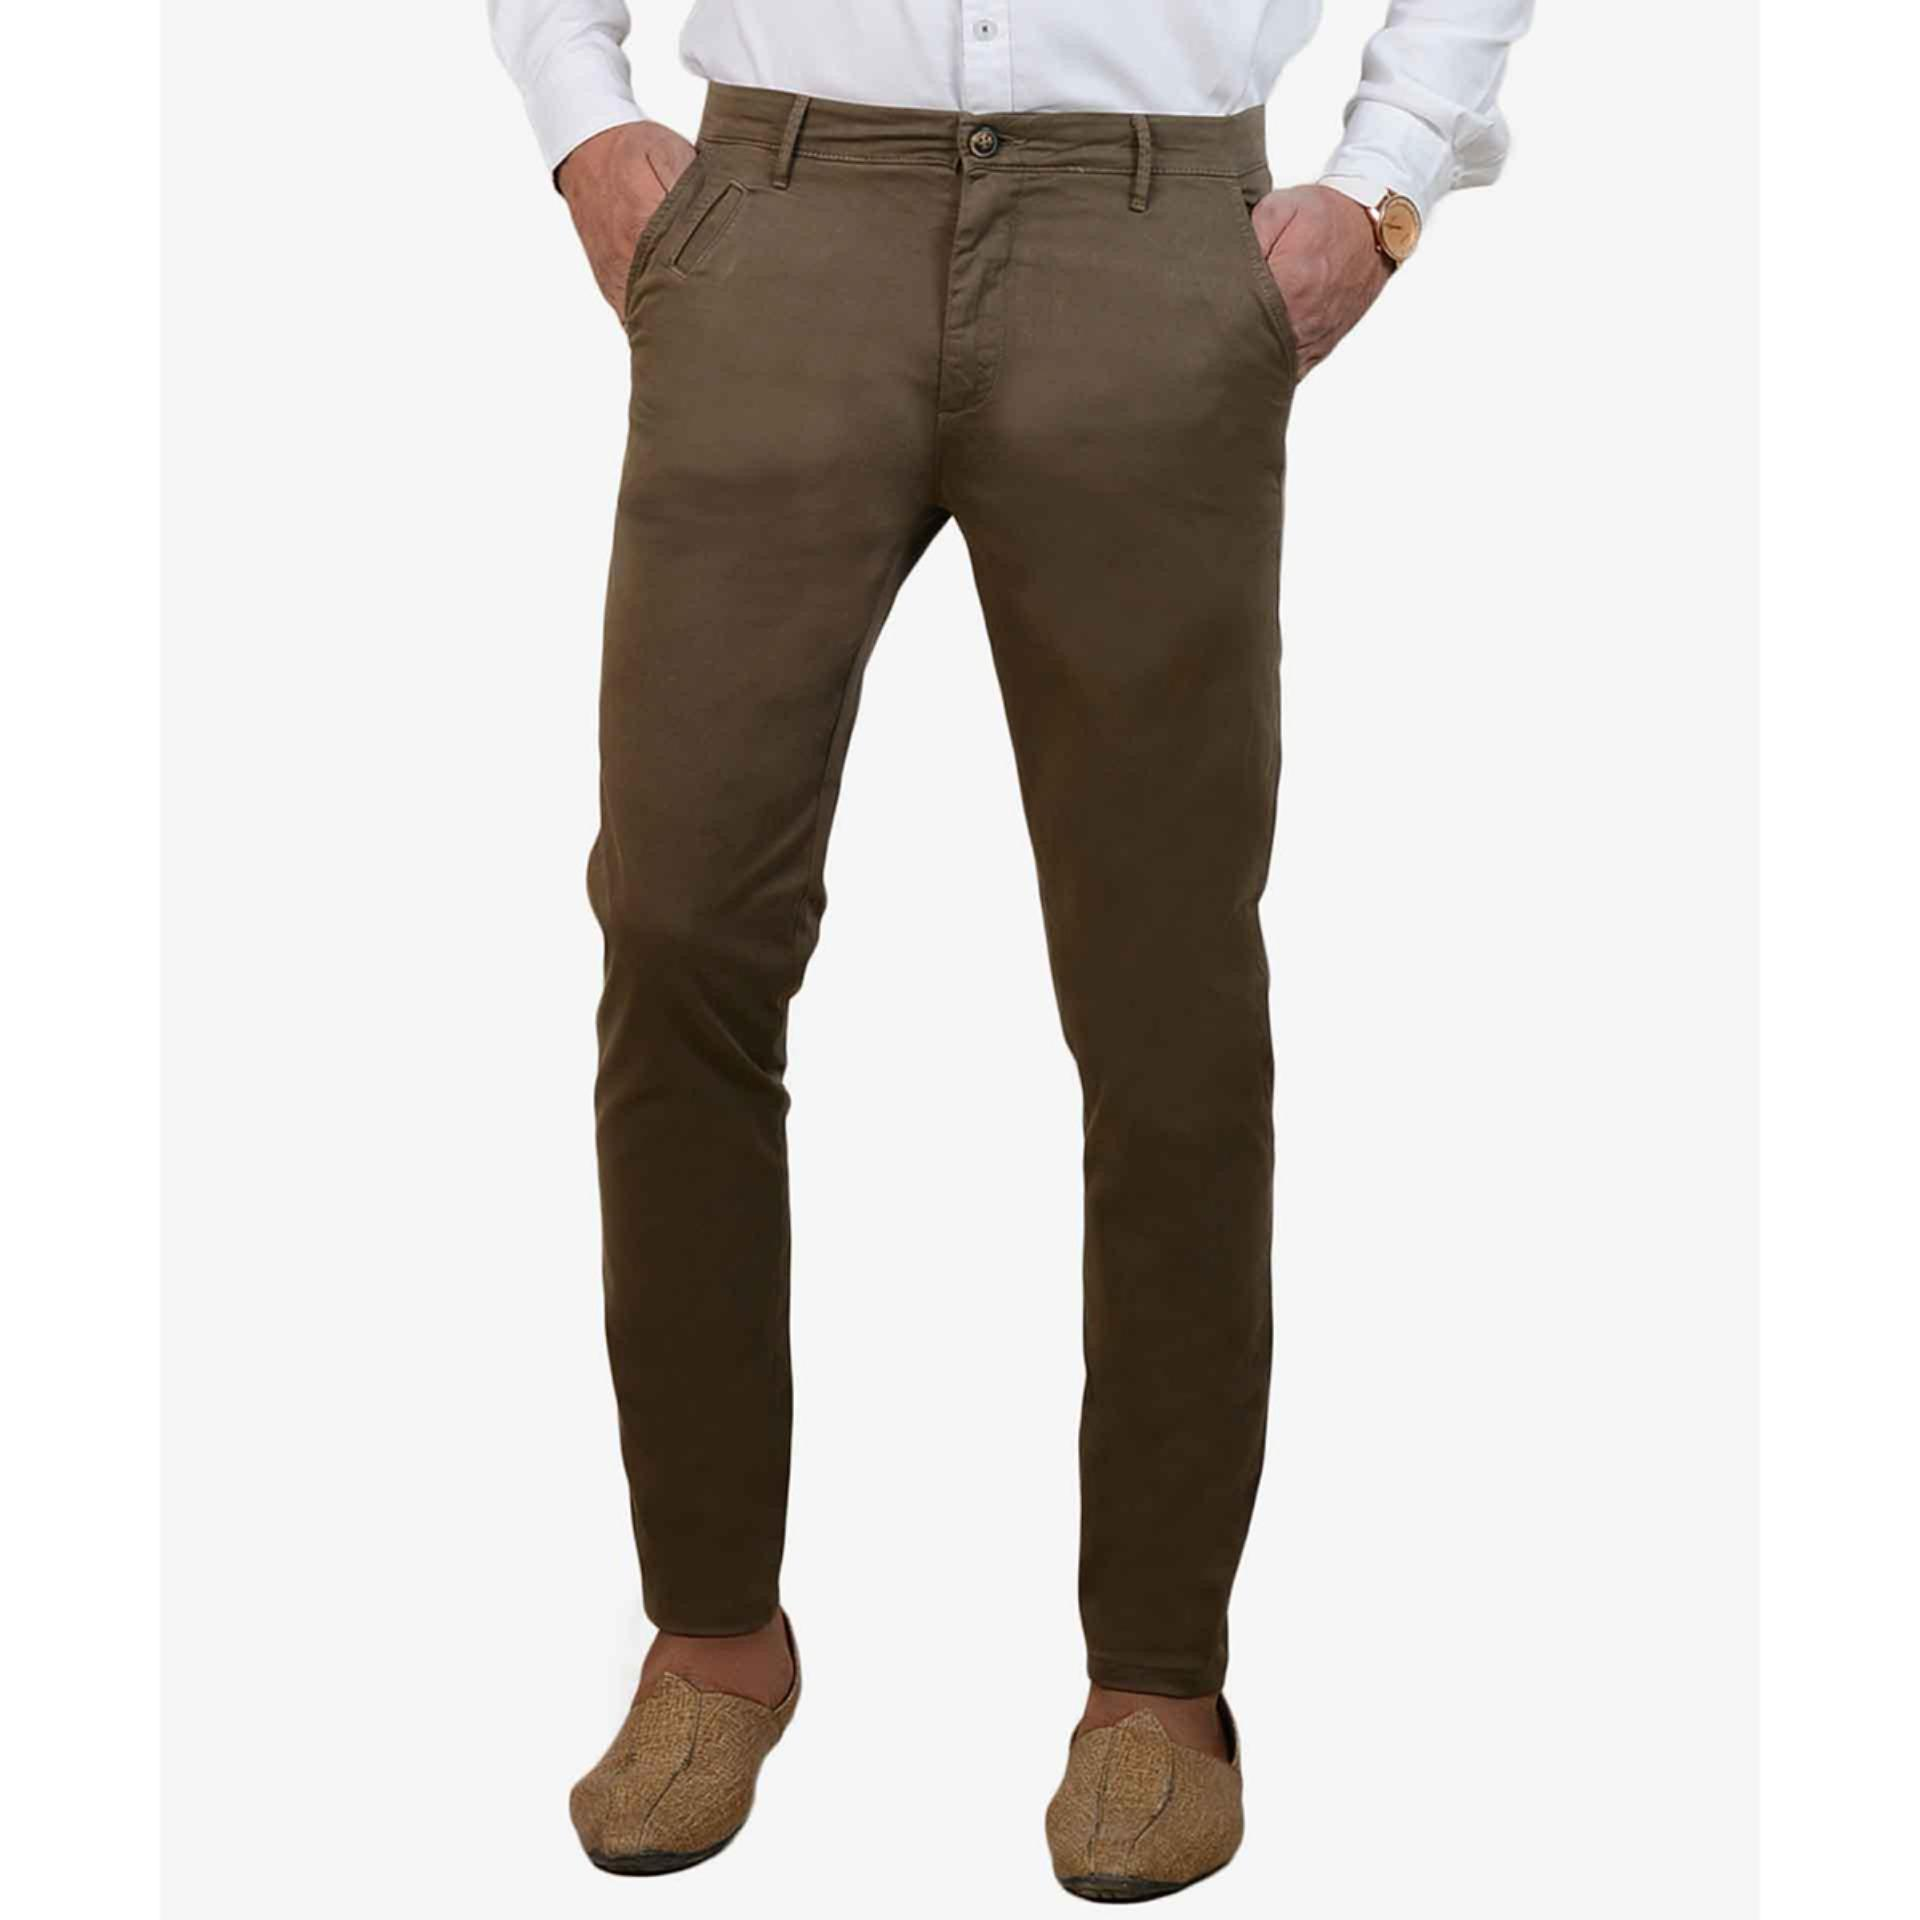 IGNITE Impeccable Beige Stretchable Chino for Men